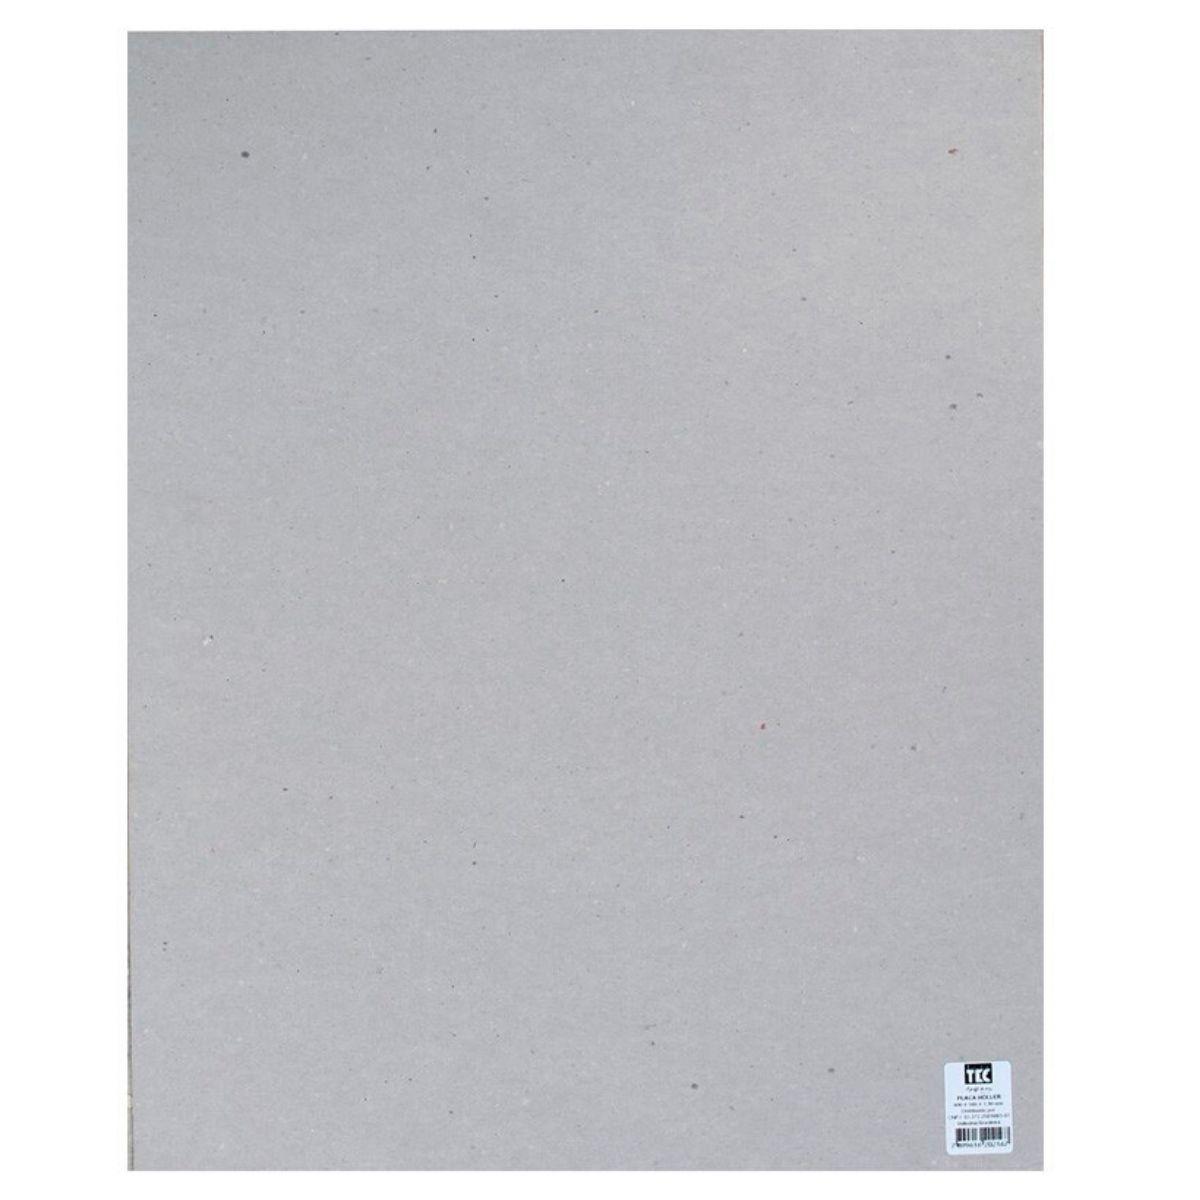 Papelão Cinza tipo Papel Holler 400 x 500 x 2mm Toke e Crie